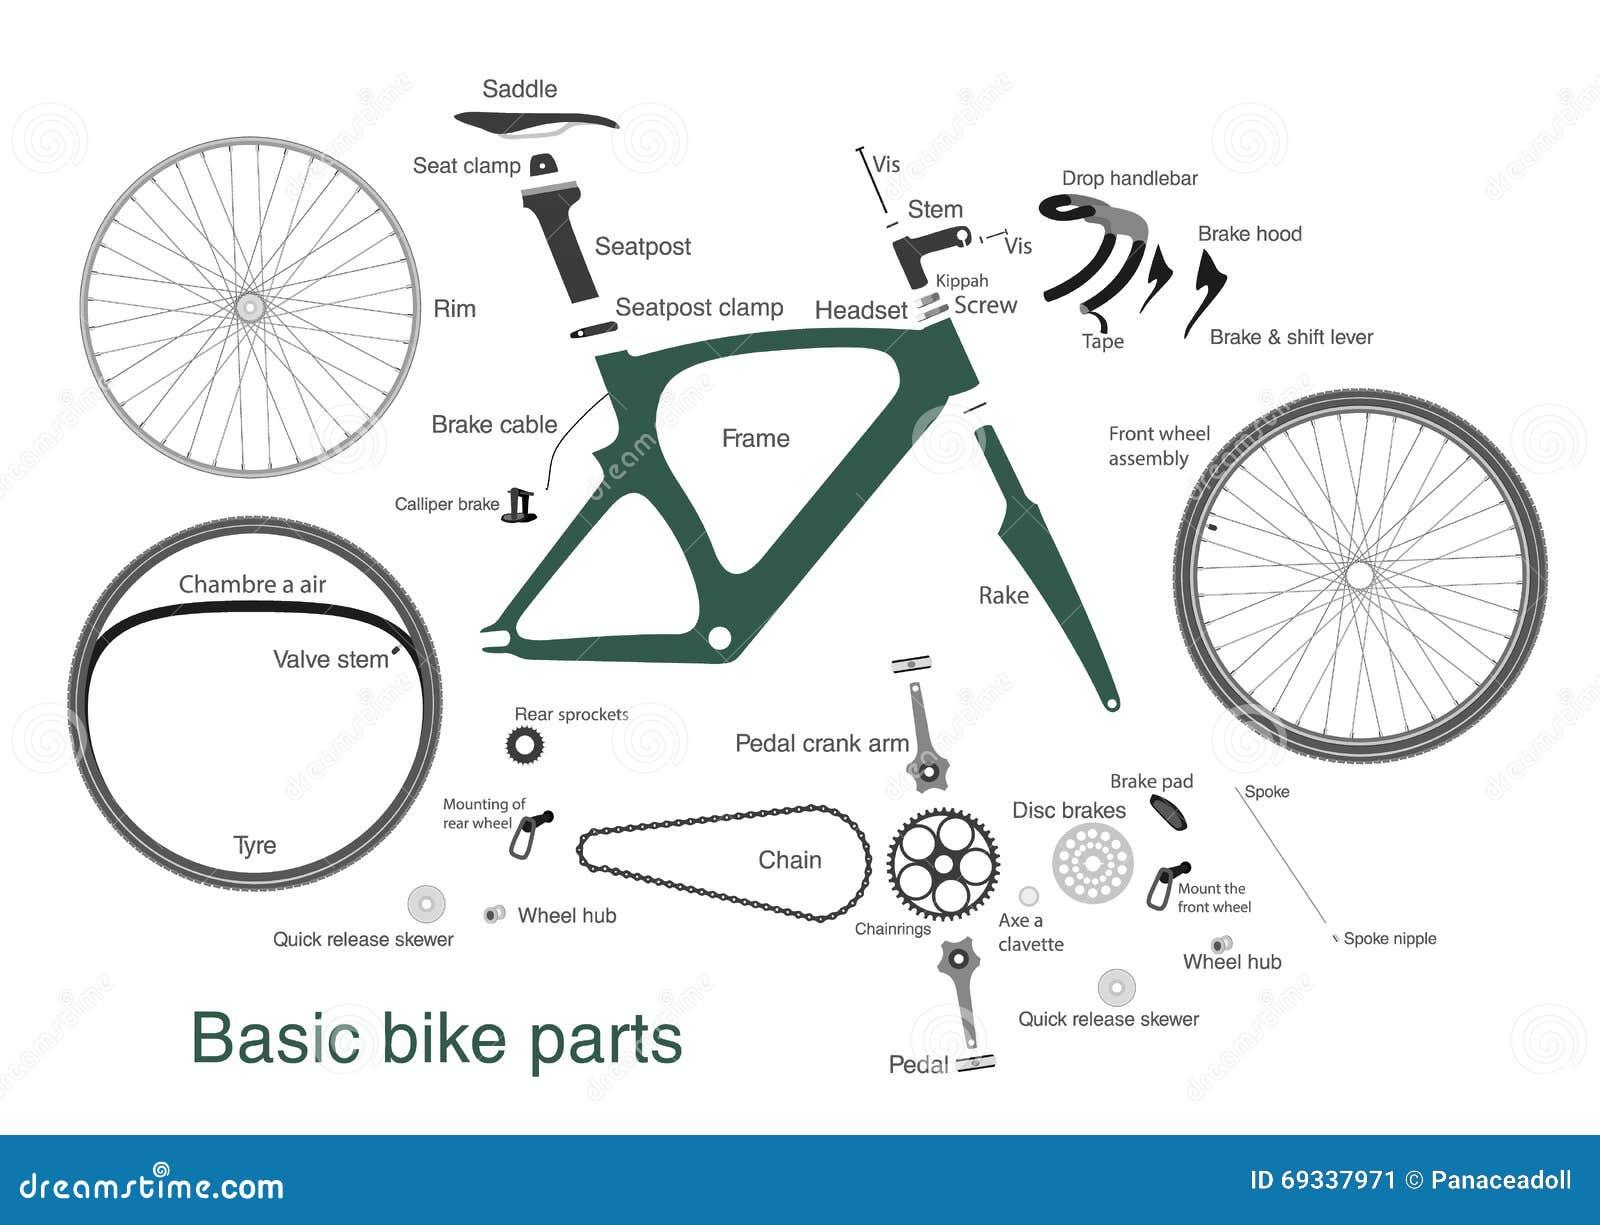 Of Main Bike Parts...